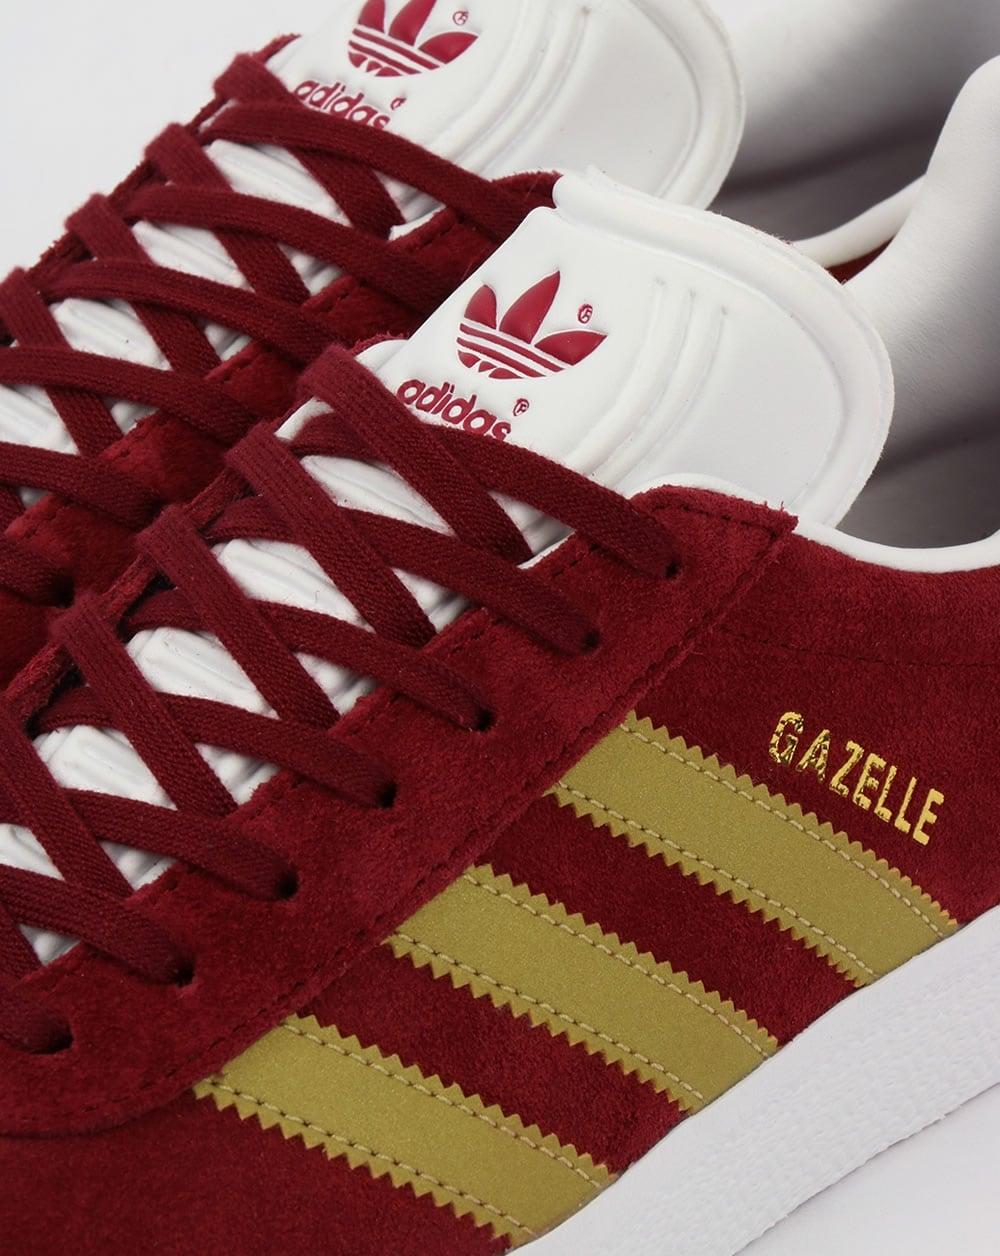 Adidas Gazelle Trainers Burgundy Gold Originals Shoes Mens